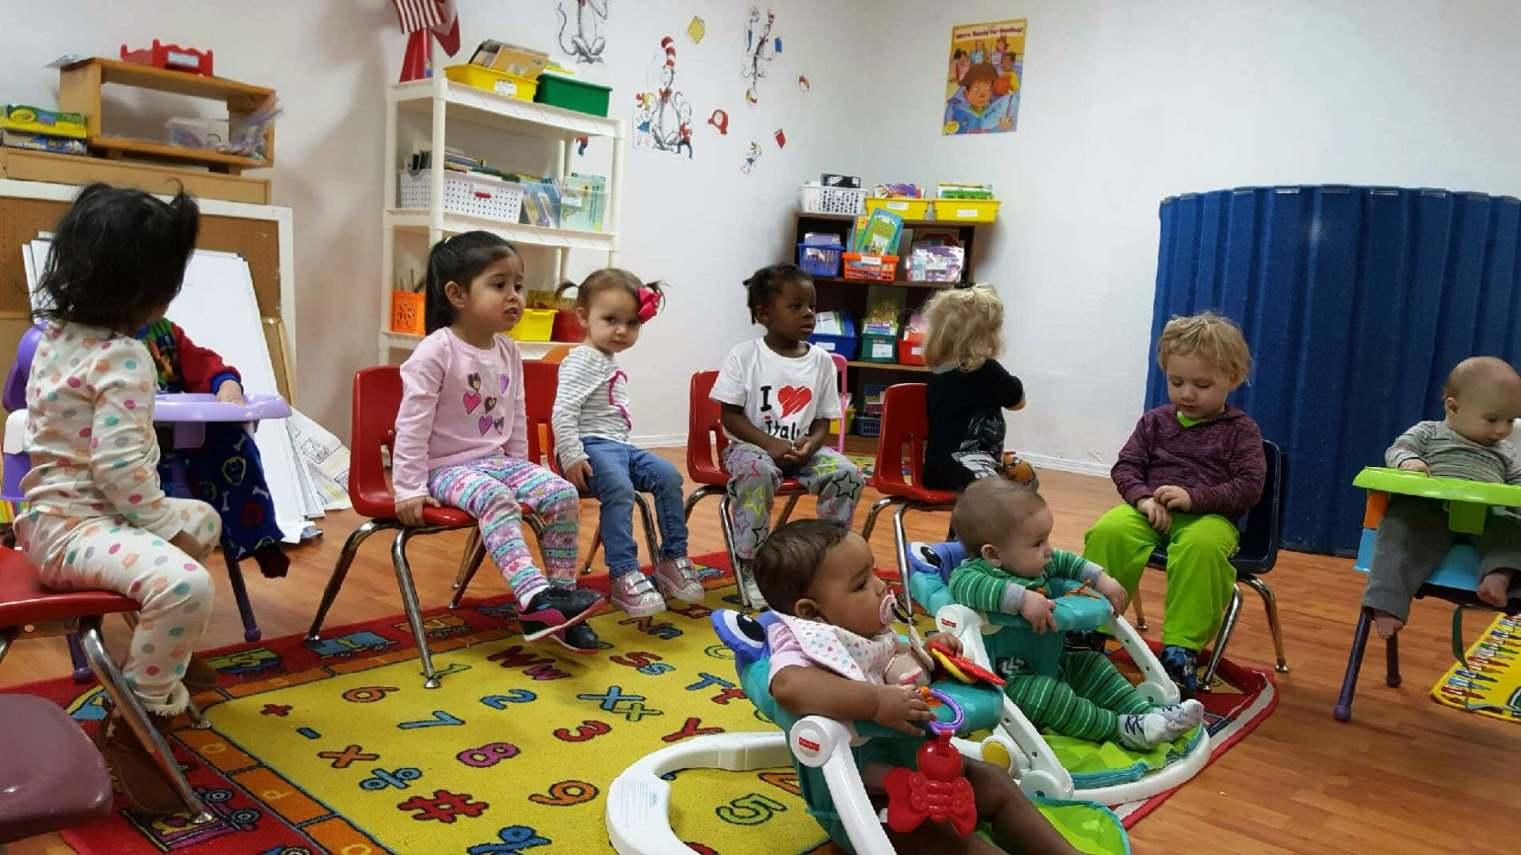 early learning center, San Antonio, TX